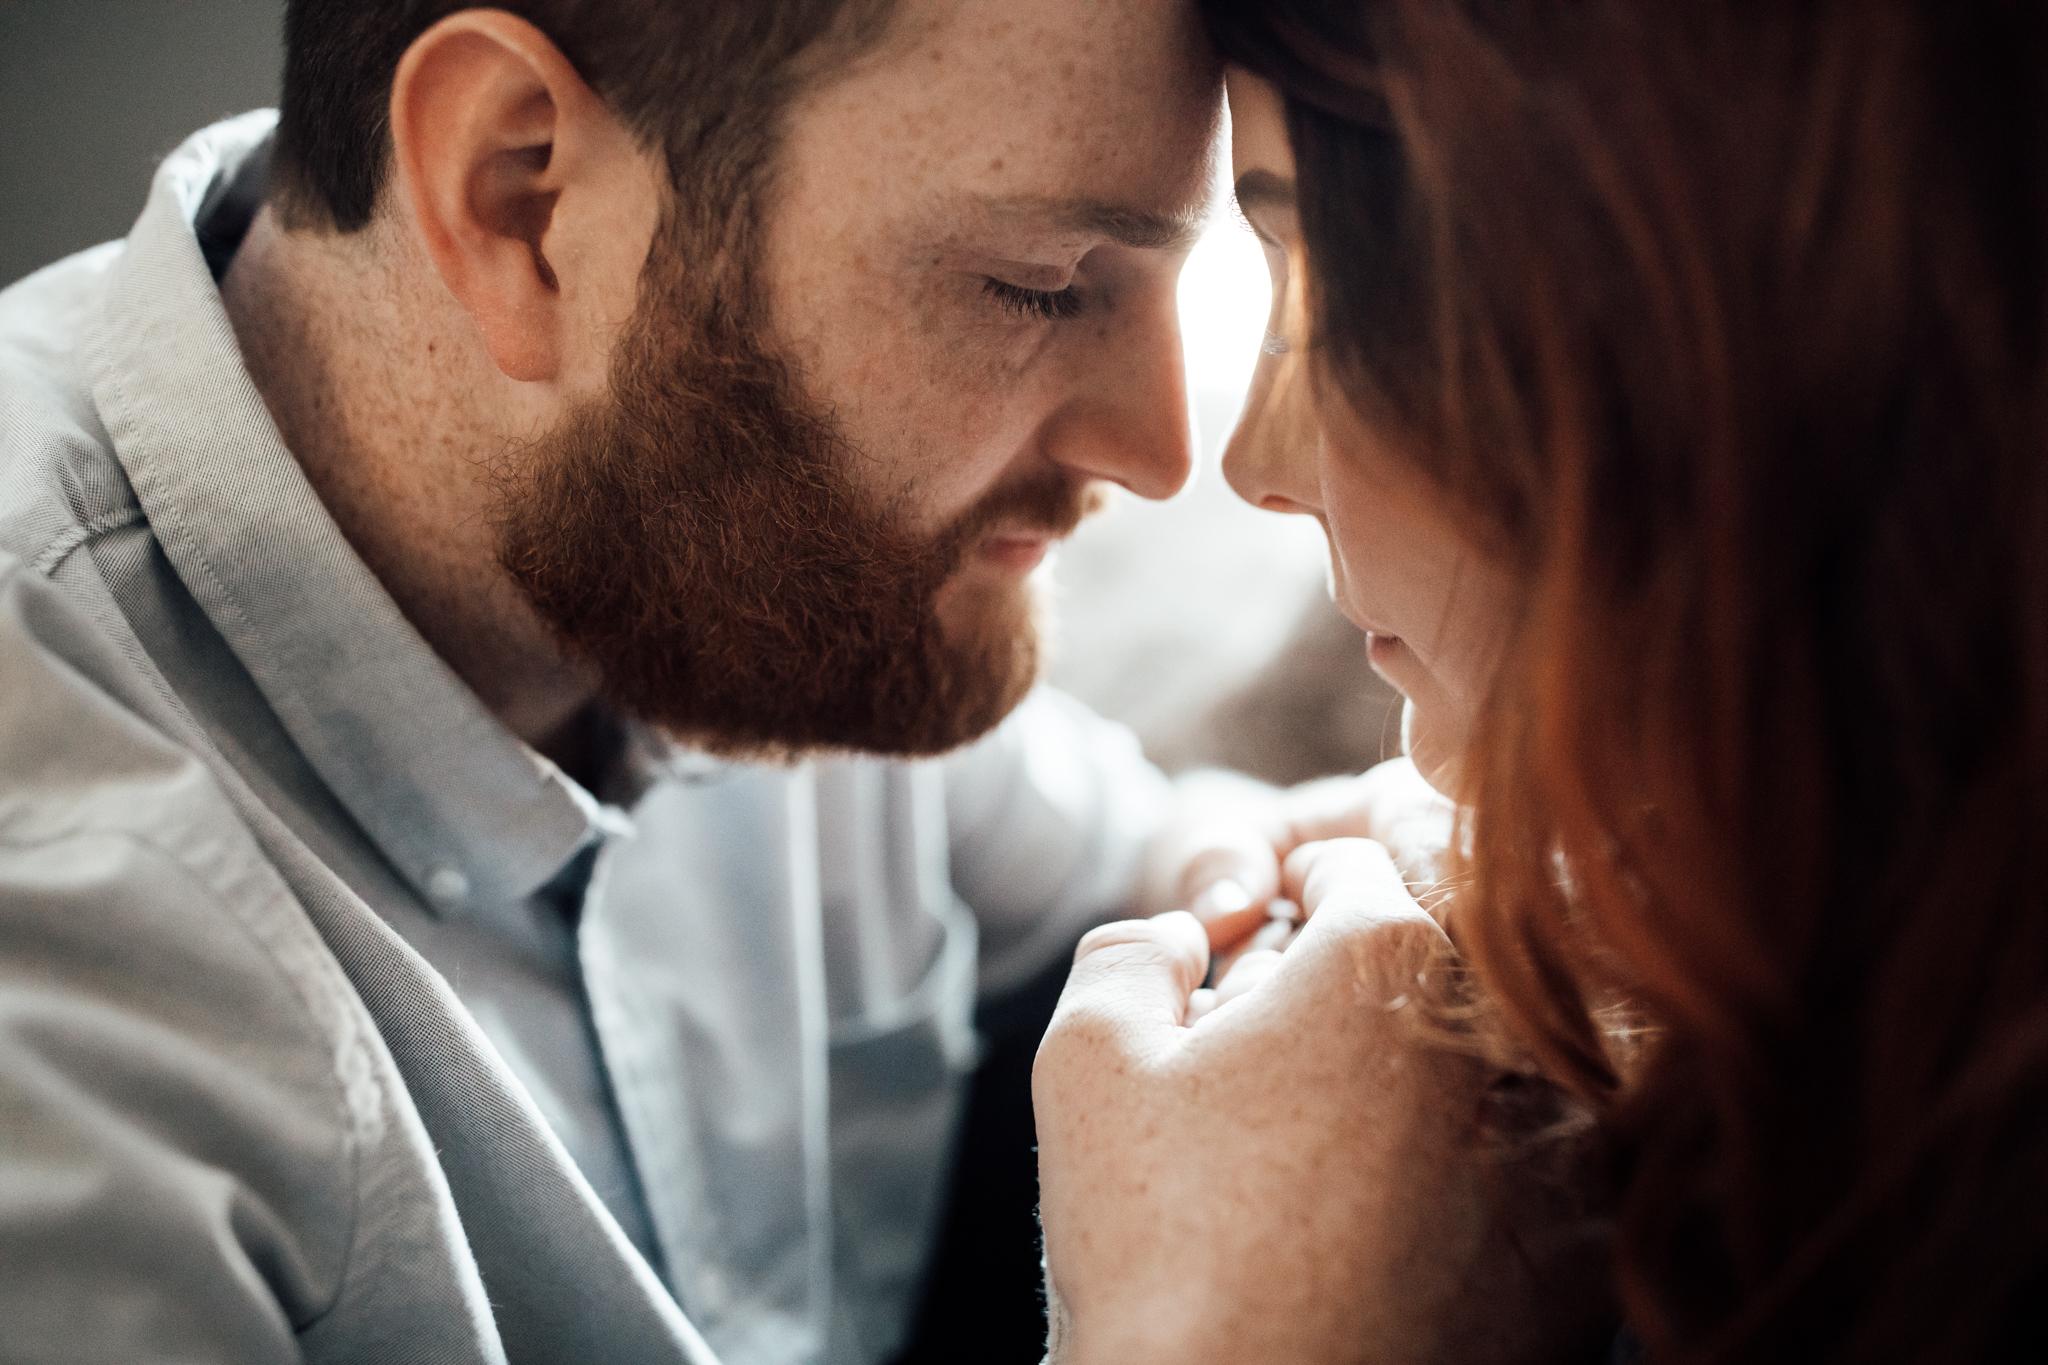 memphis-wedding-photographer-thewarmtharoundyou-midtown-recroom-engagement-pictures (36 of 123).jpg